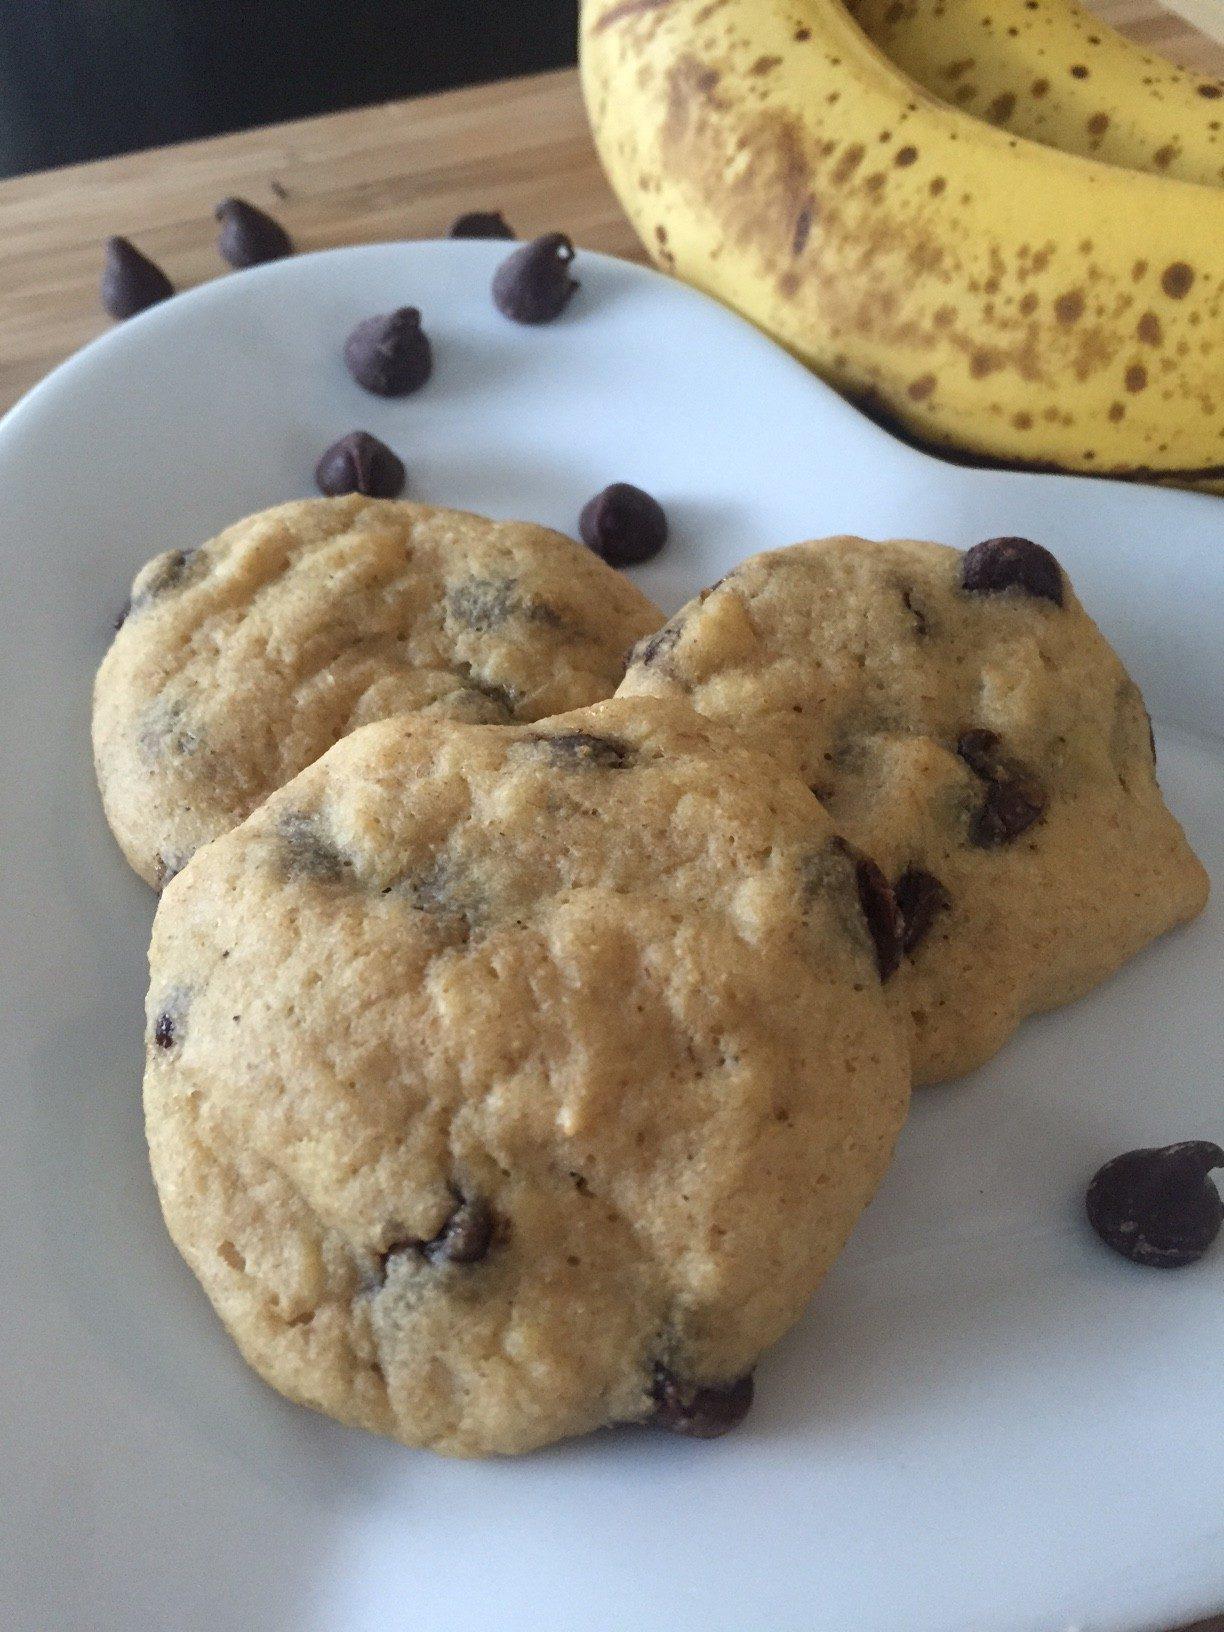 HIgh Protein Banana Chocolate Chip Breakfast Cookies